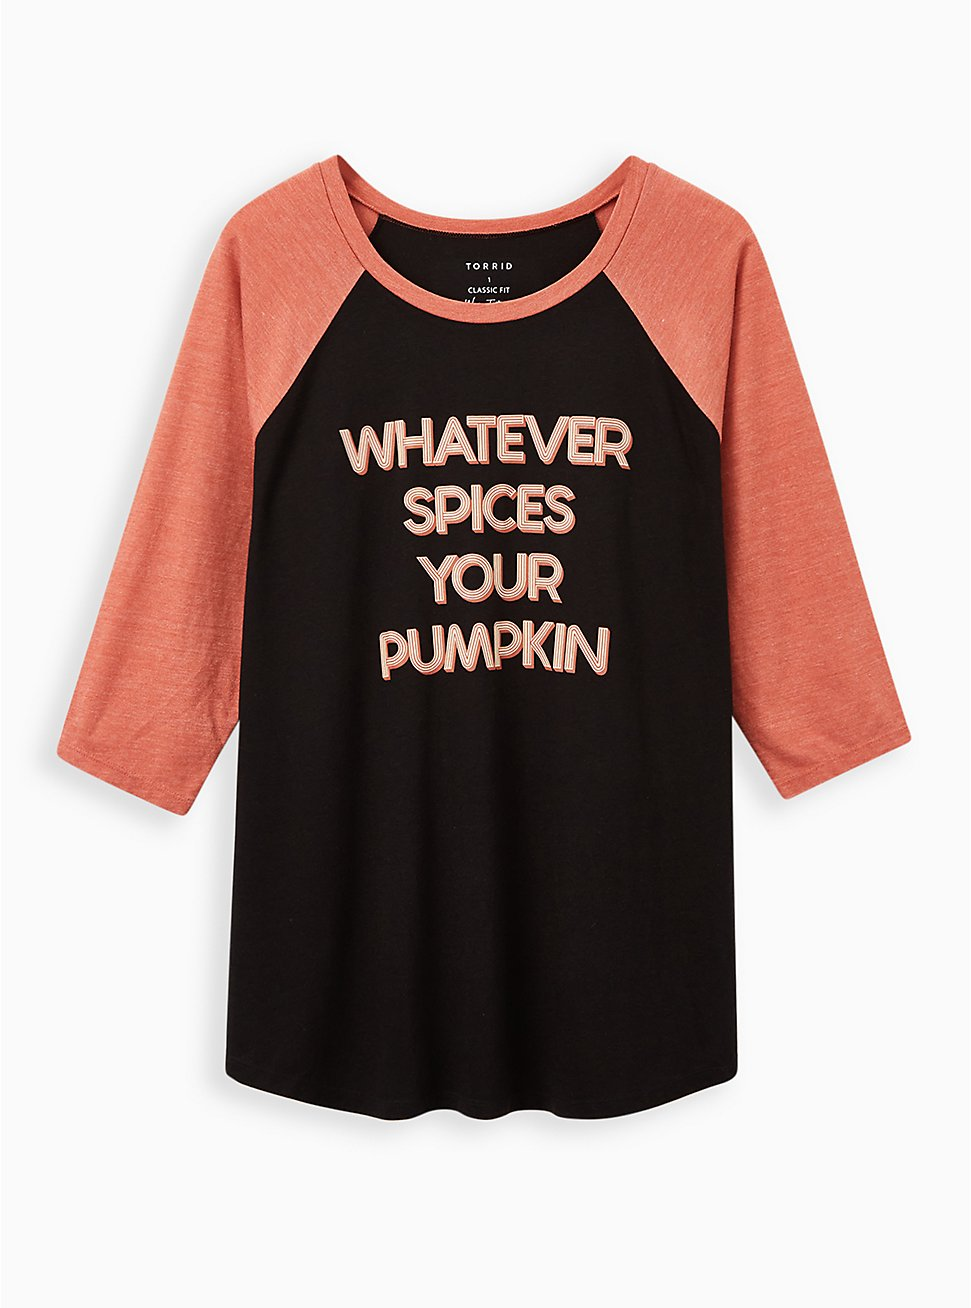 Classic Fit Raglan Tee - Whatever Spices Your Pumpkin Black, DEEP BLACK, hi-res